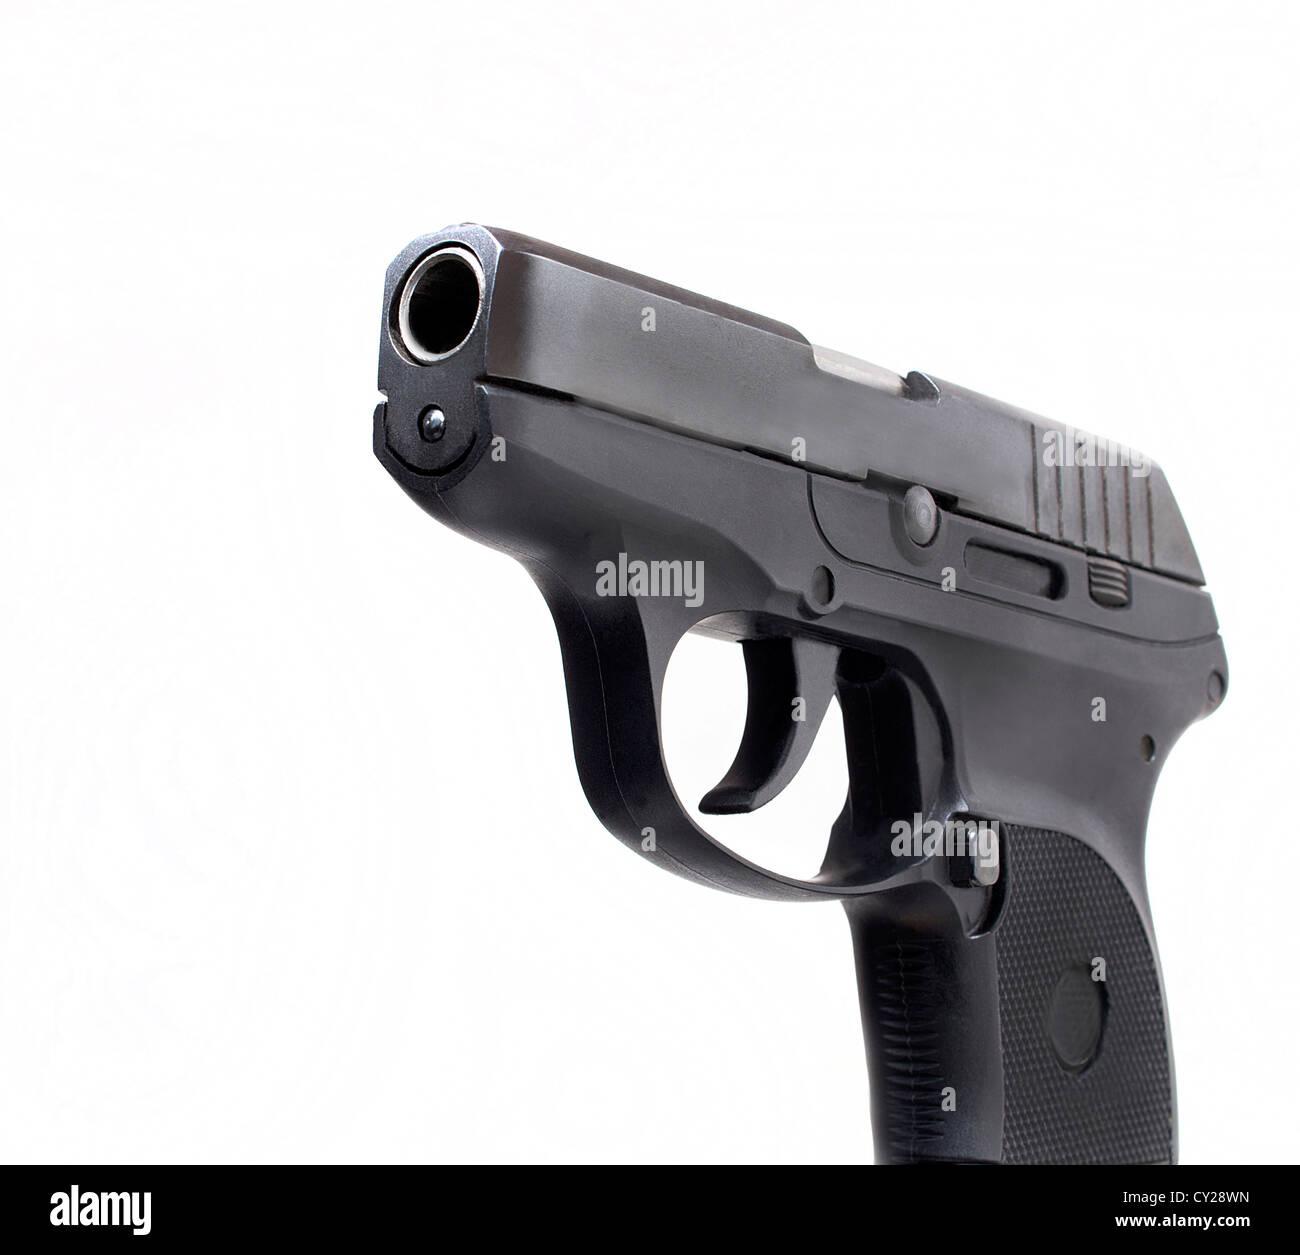 Pistol 1 - Stock Image